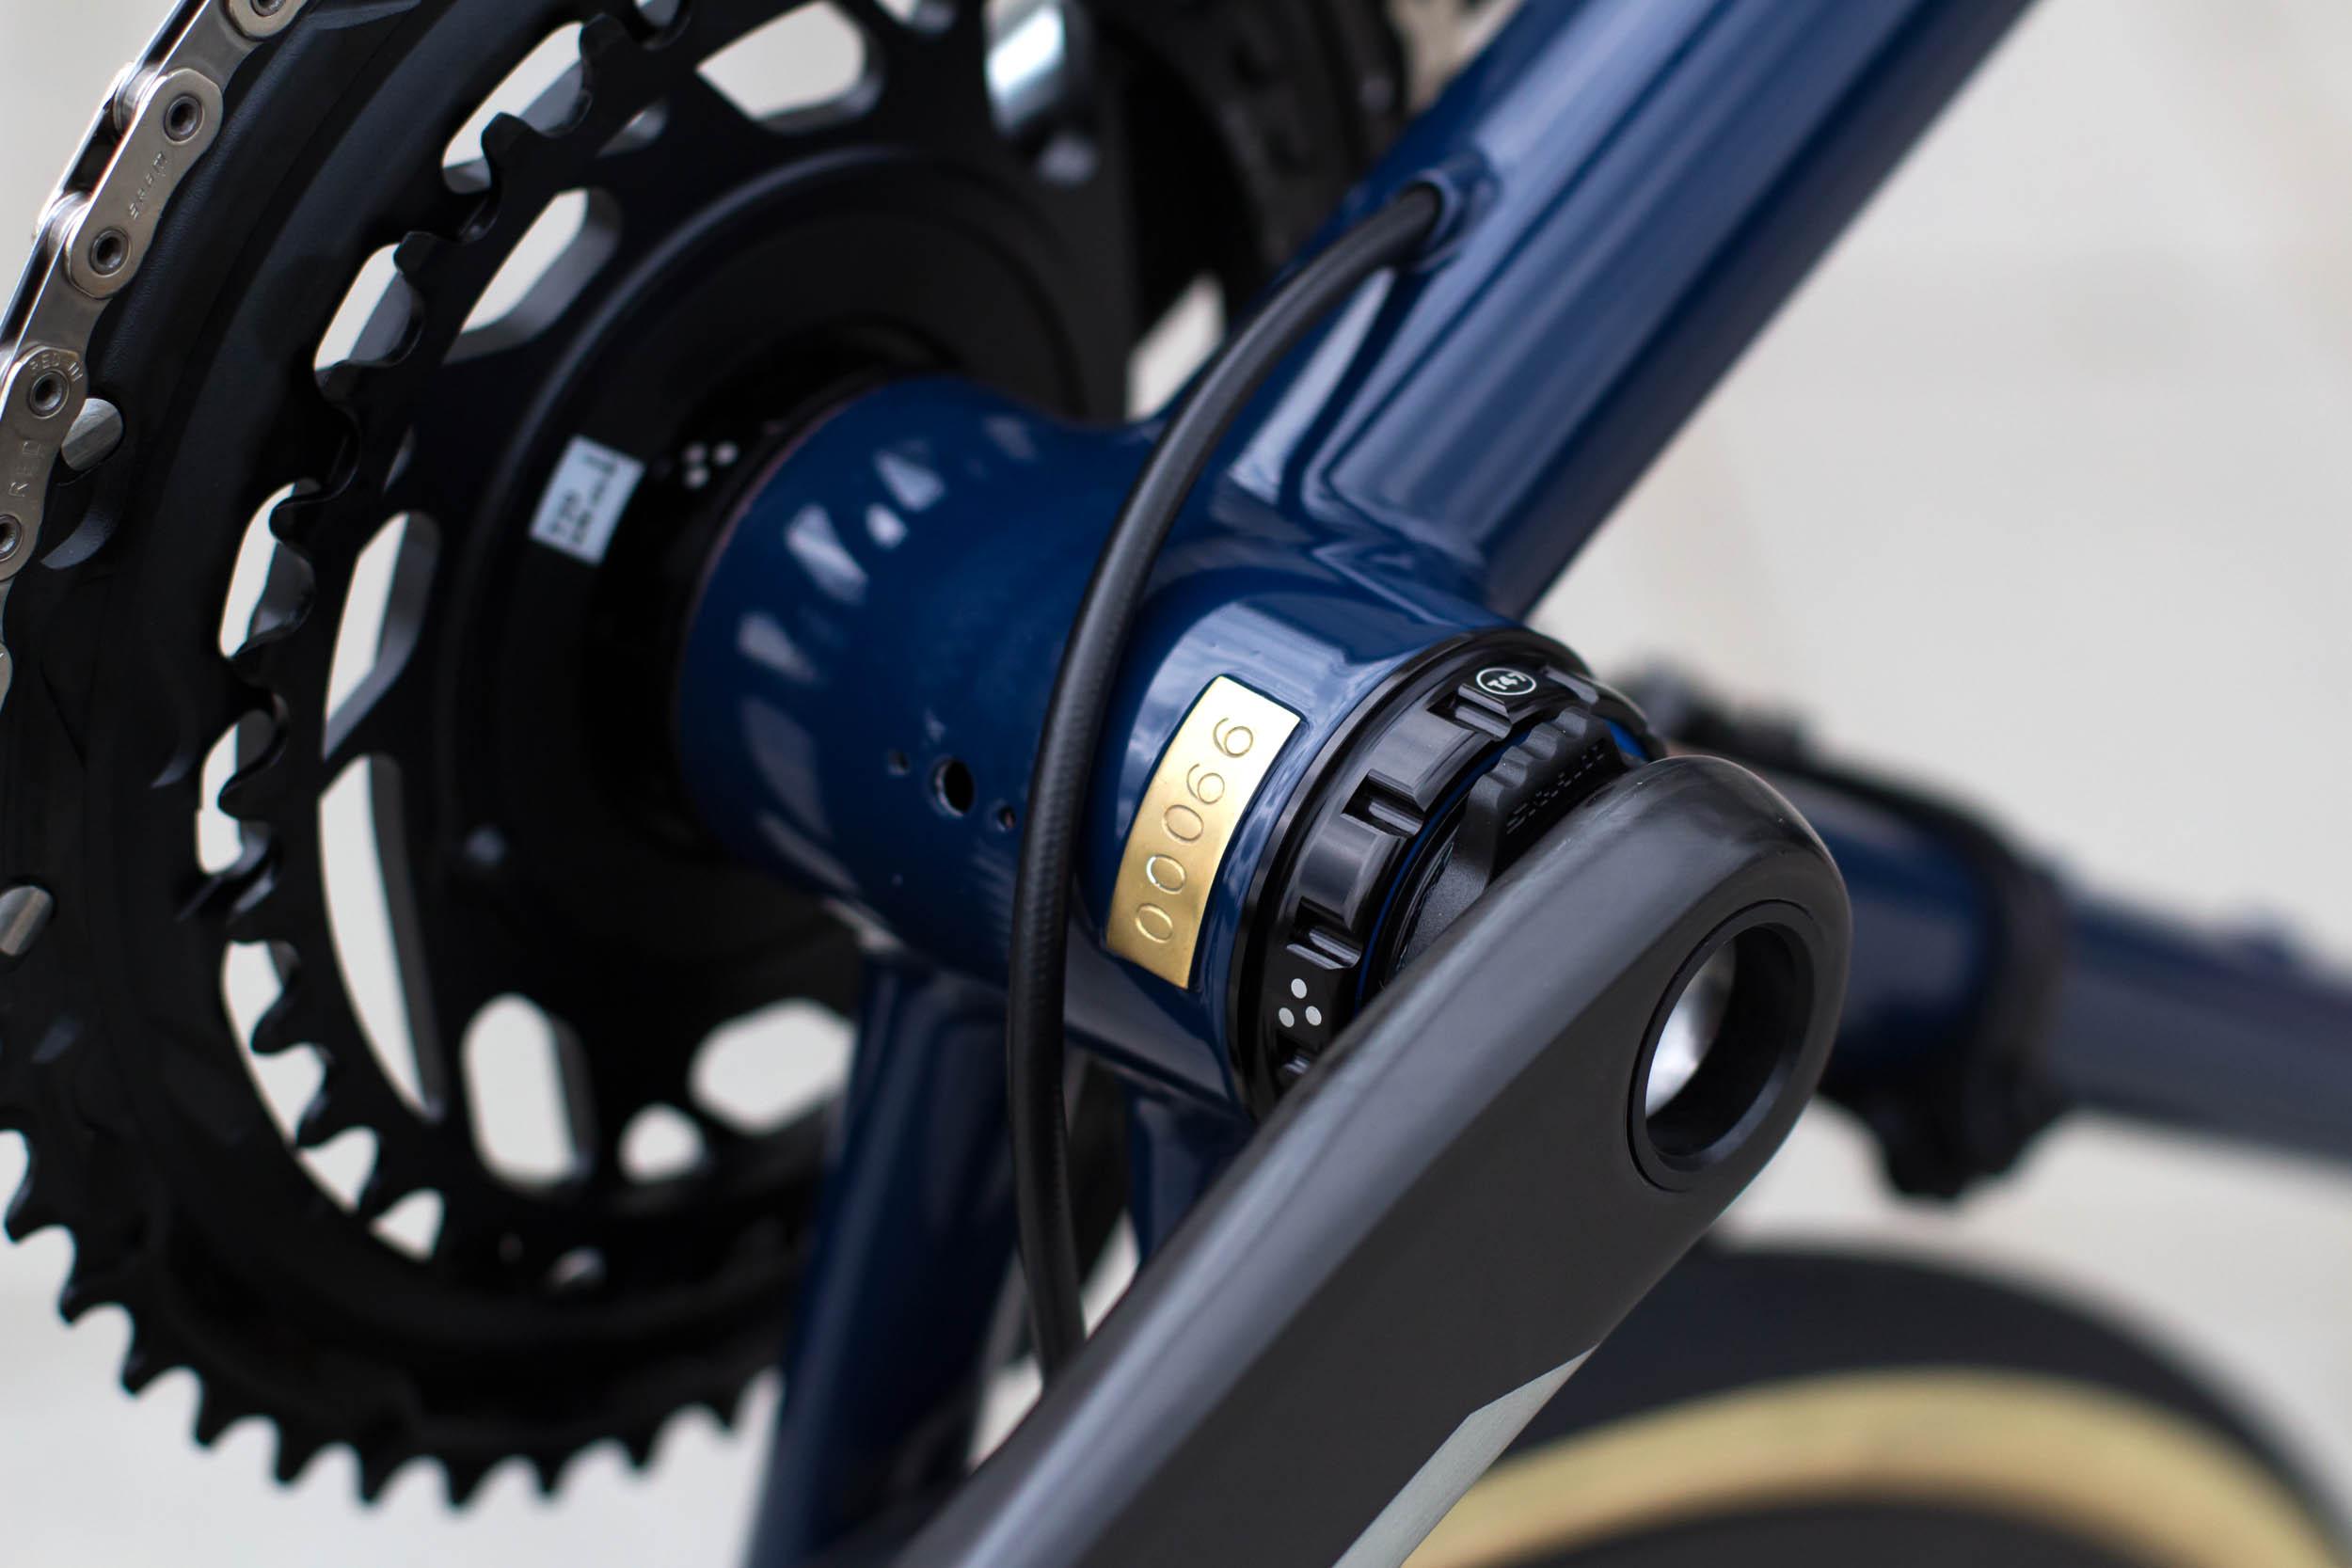 quirk_cycles_charlie_sheldon_durmitor_14.jpg